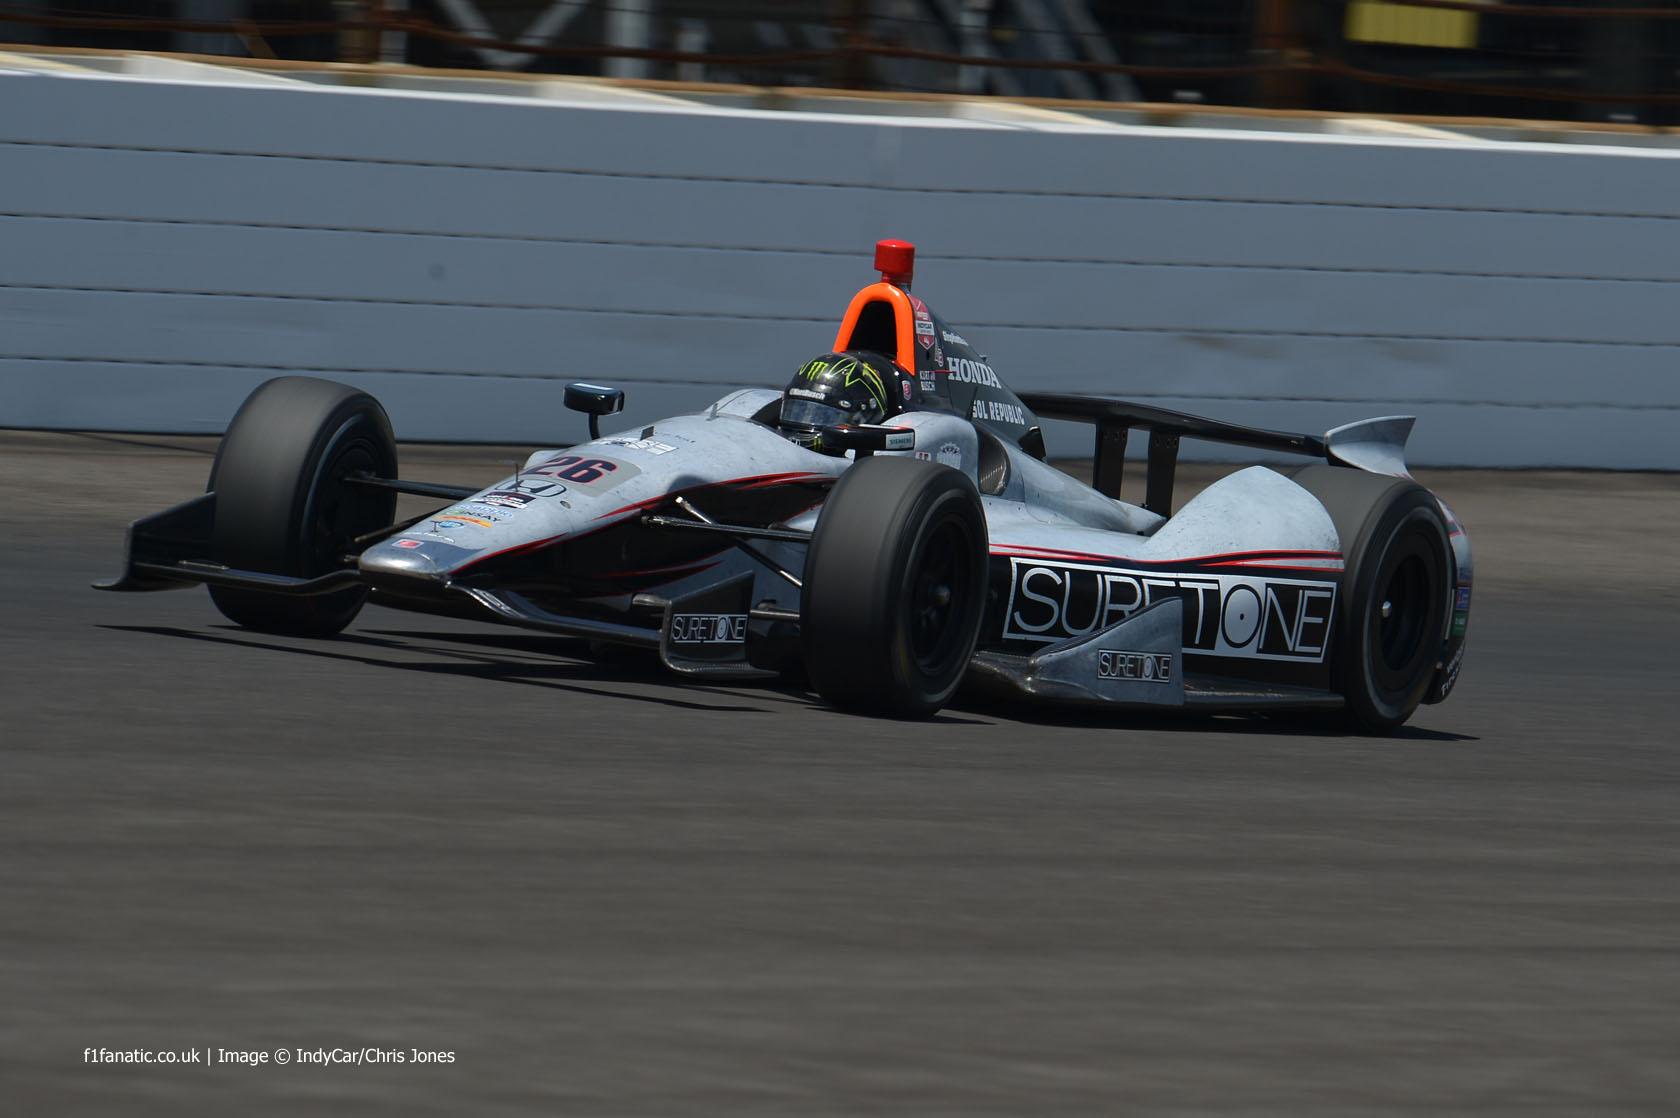 Kurt Busch, Andretti, Indianapolis, 2014